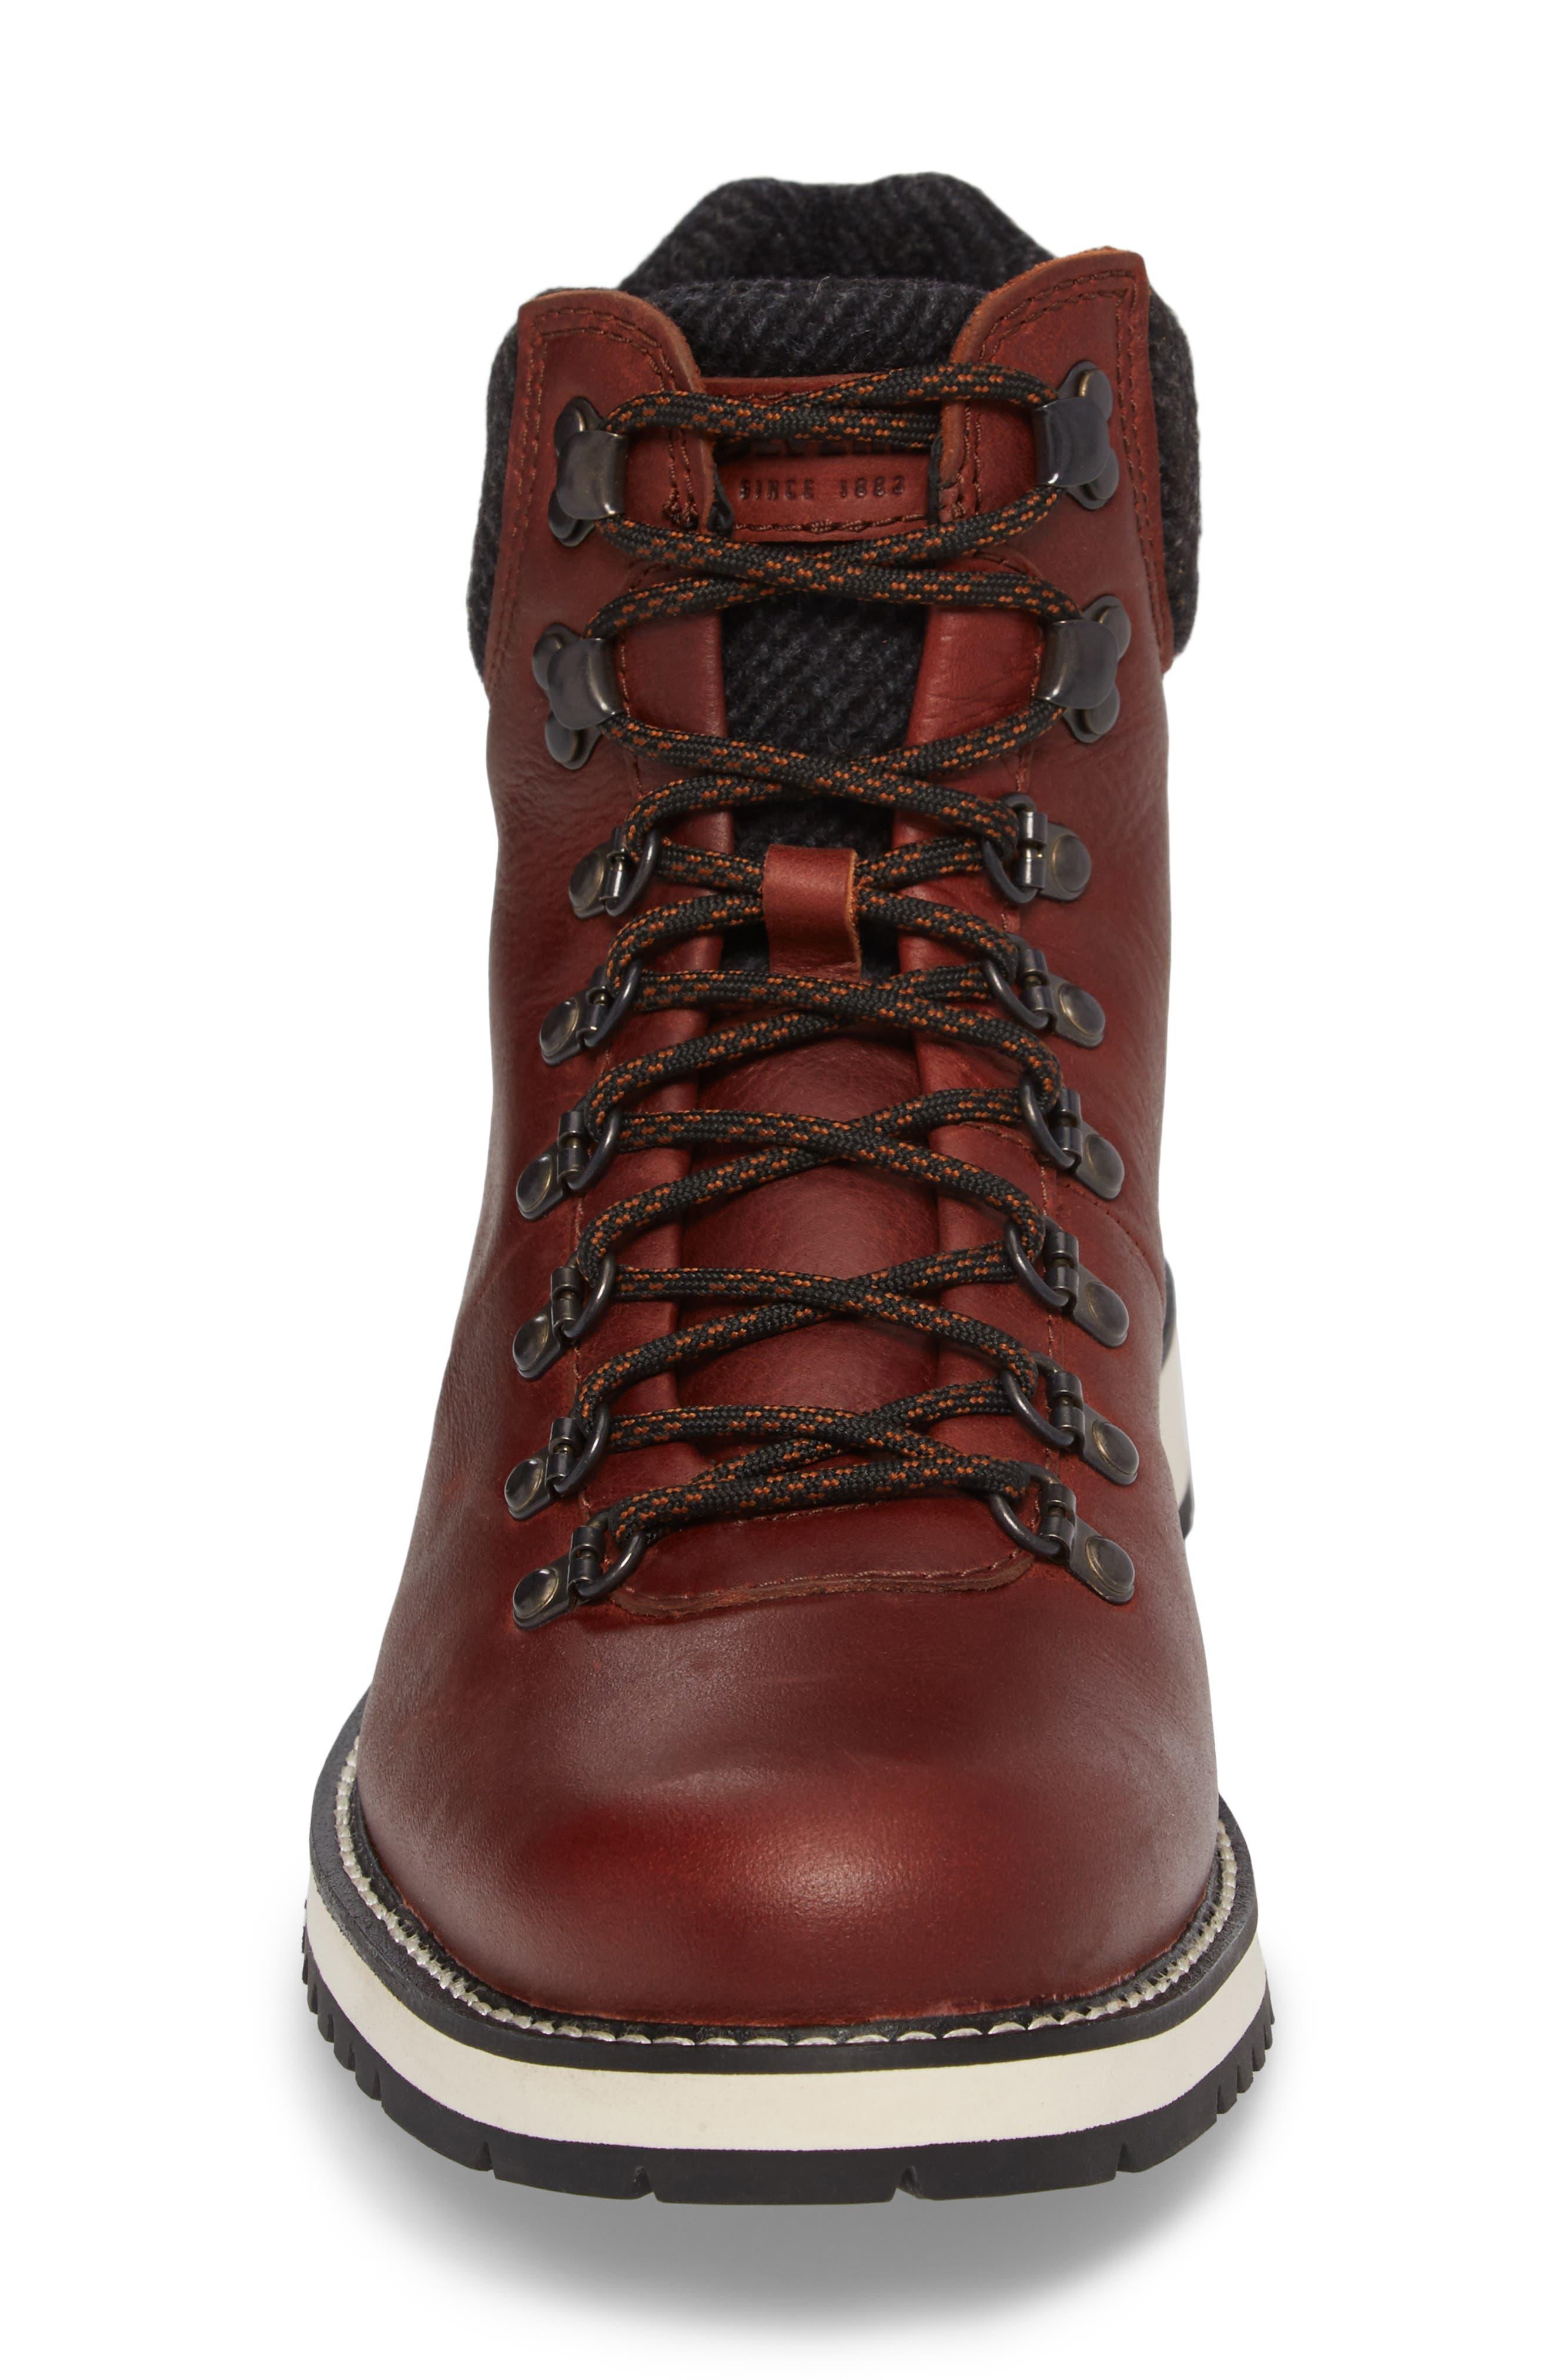 Sidney Waterproof Plain Toe Boot,                             Alternate thumbnail 4, color,                             Brown